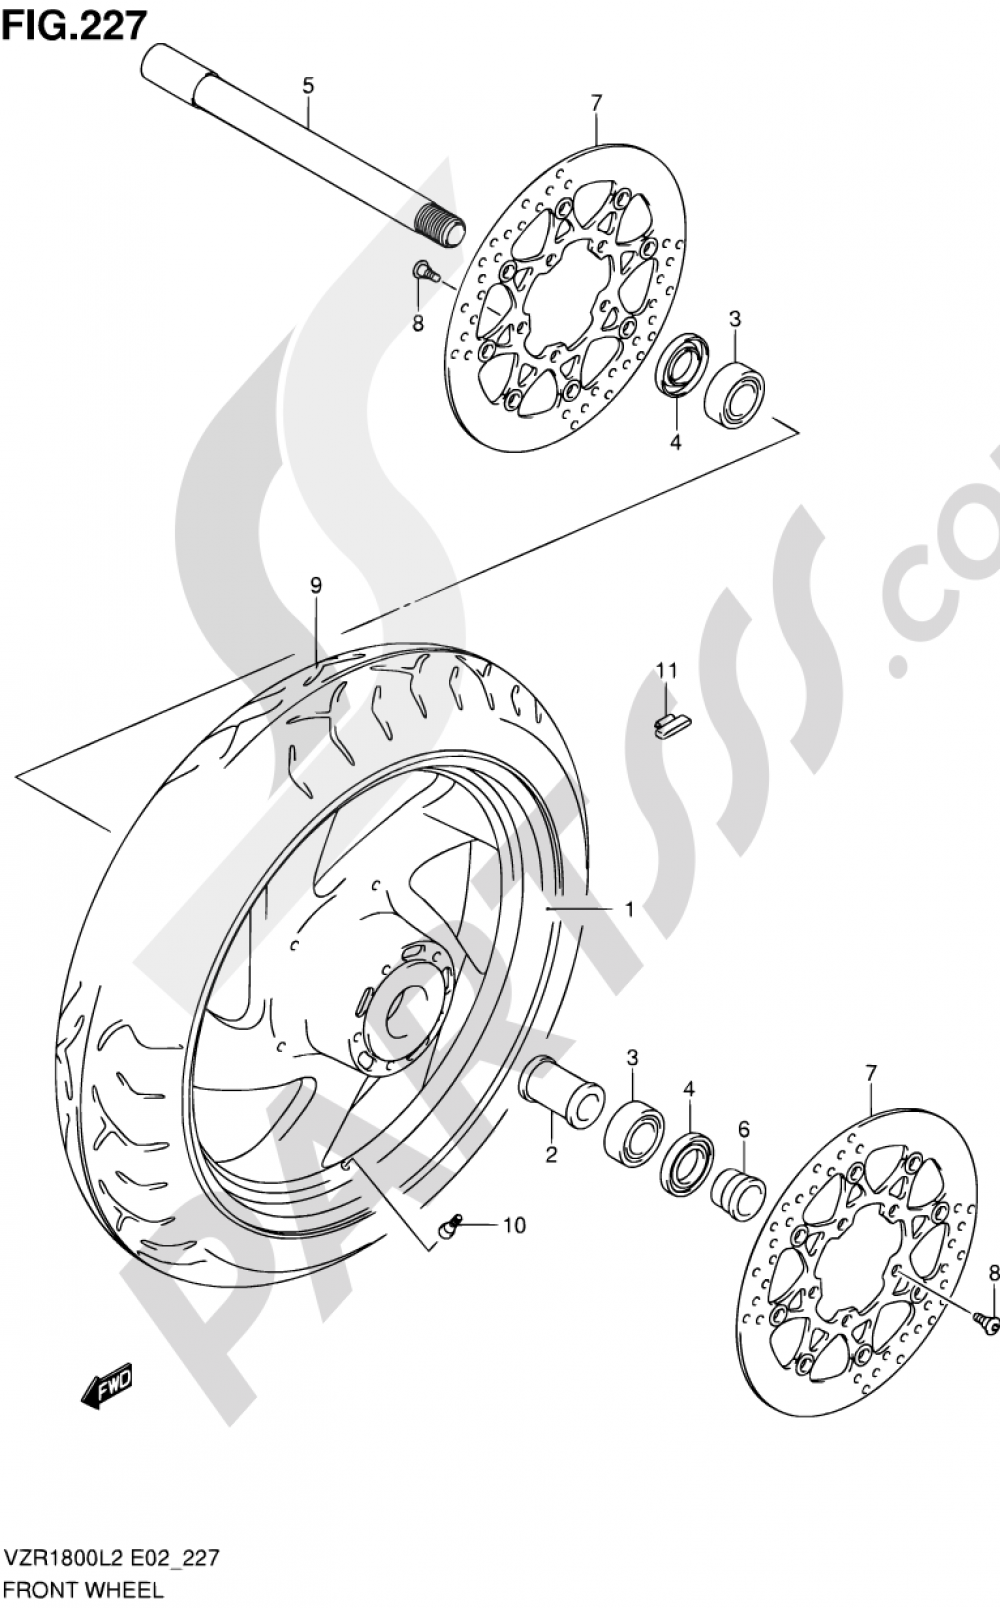 227 - FRONT WHEEL (VZR1800ZL2 E02) Suzuki VZR1800Z 2002